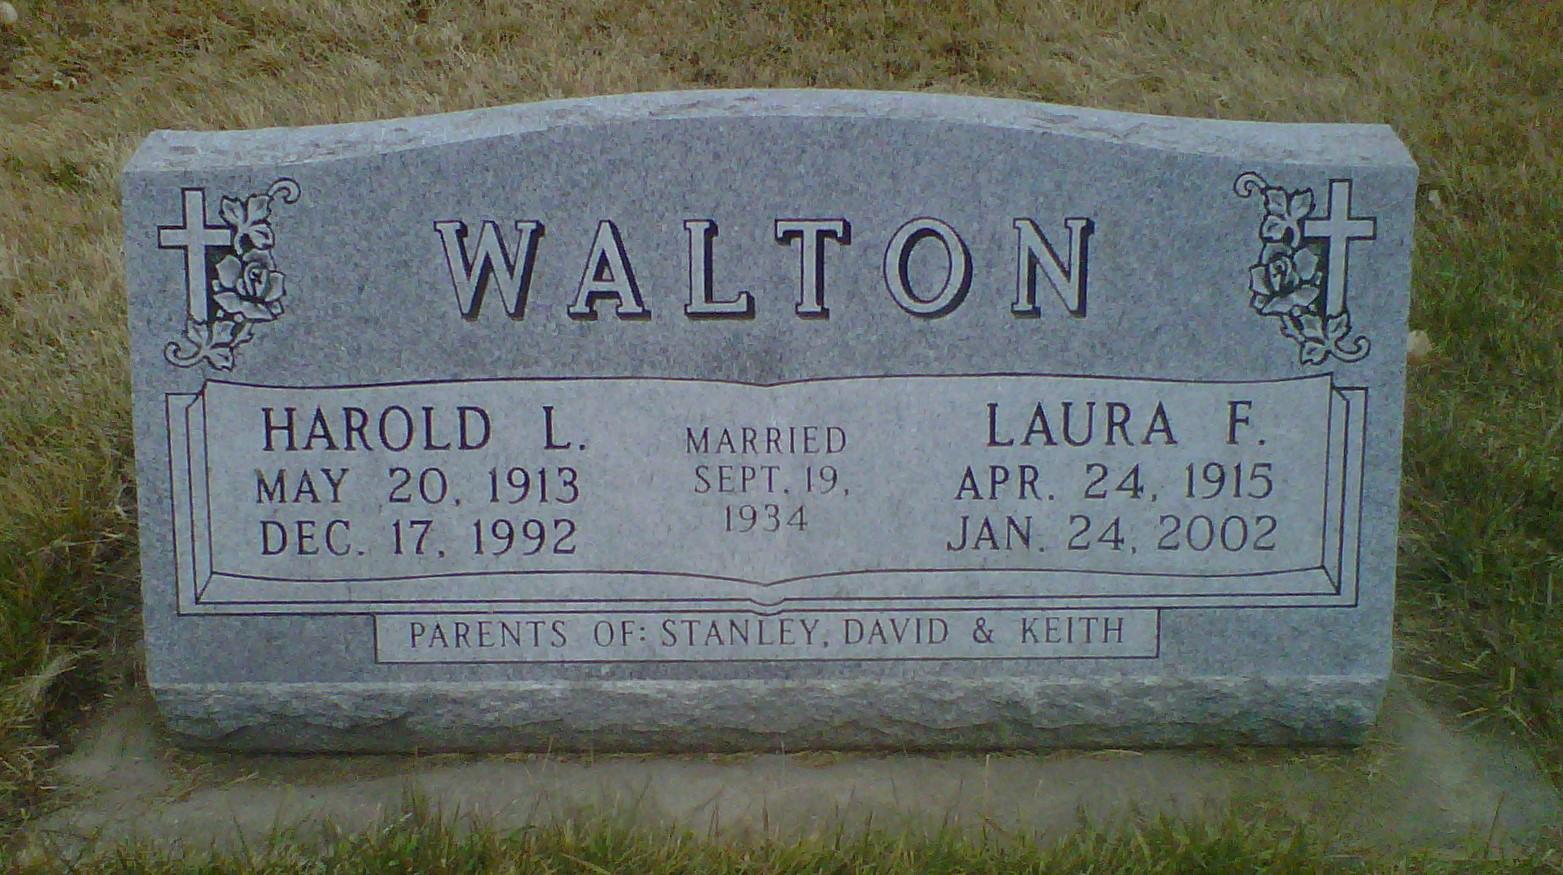 Harold W Walton